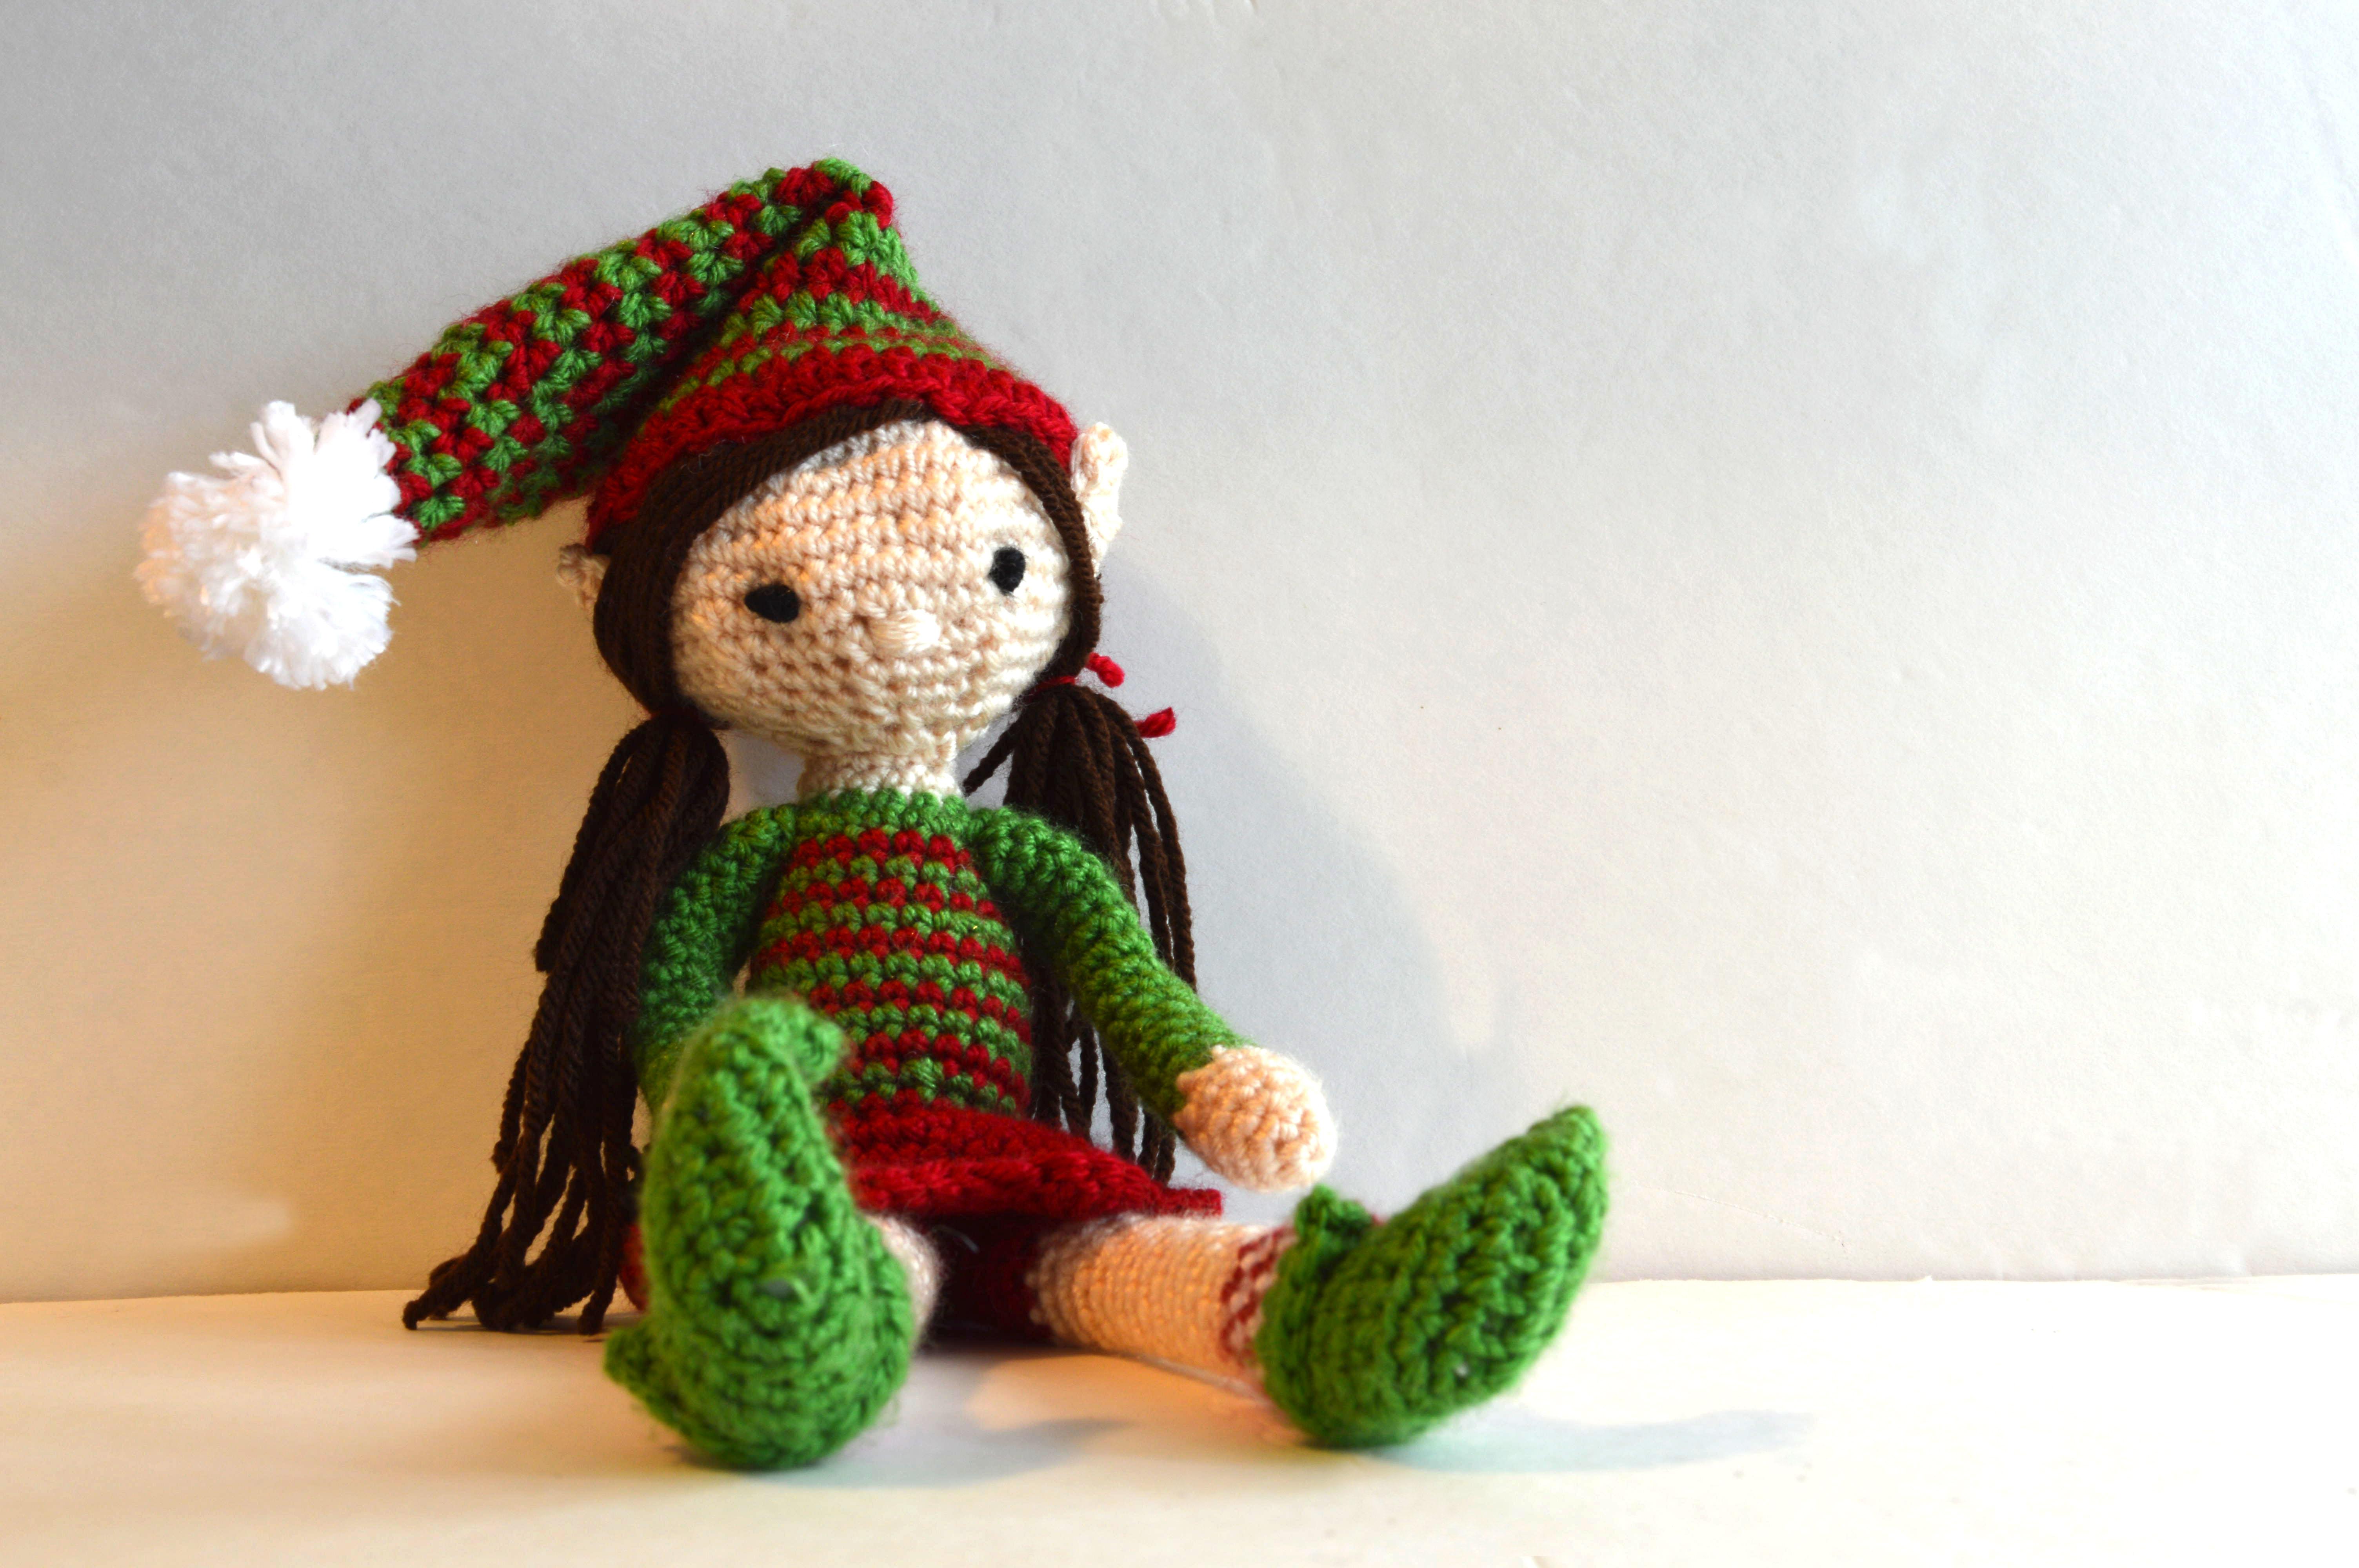 Crochet: Elf on the Shelf – chelsiebrady